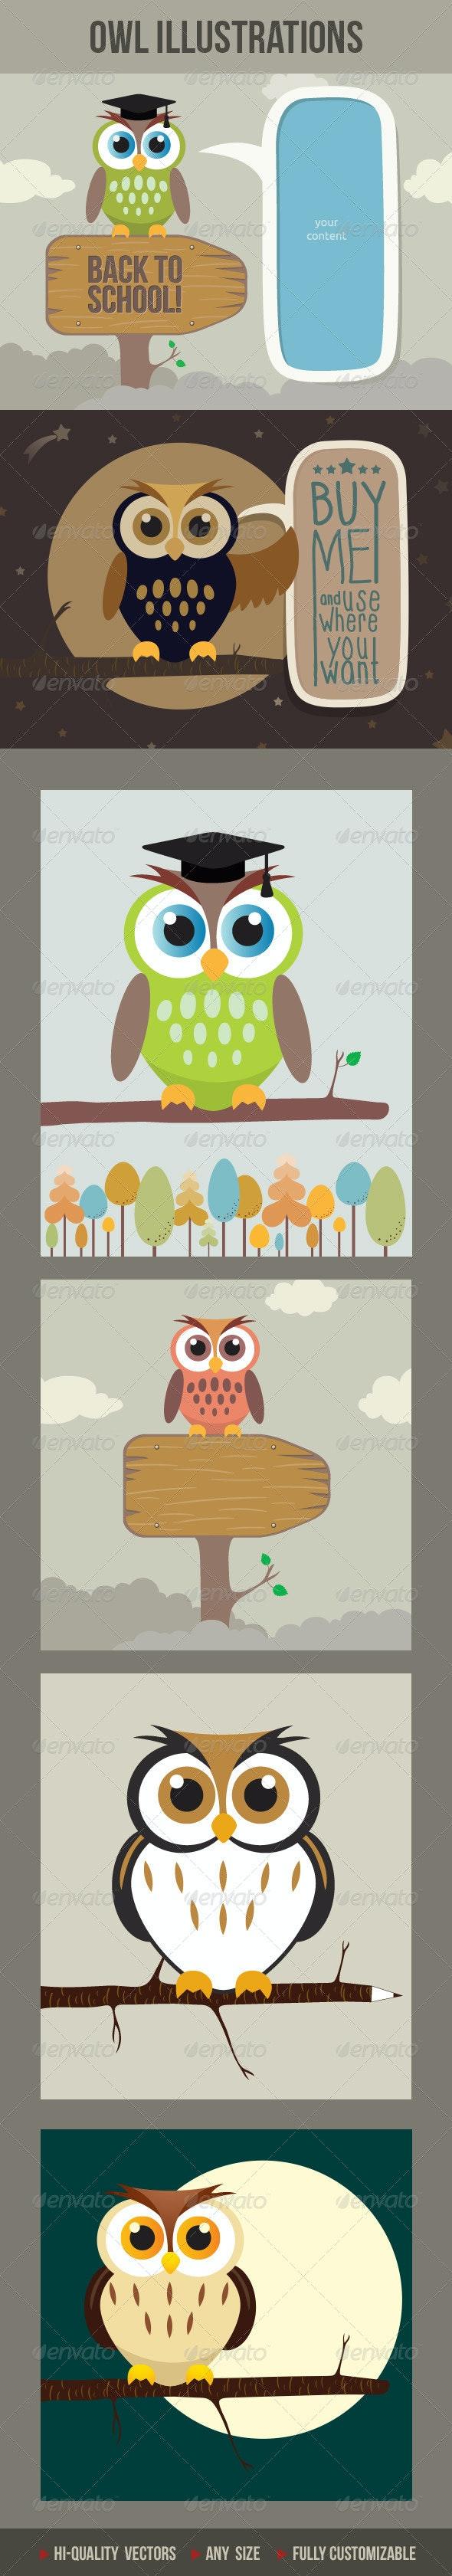 Cartoon Owls - Animals Characters